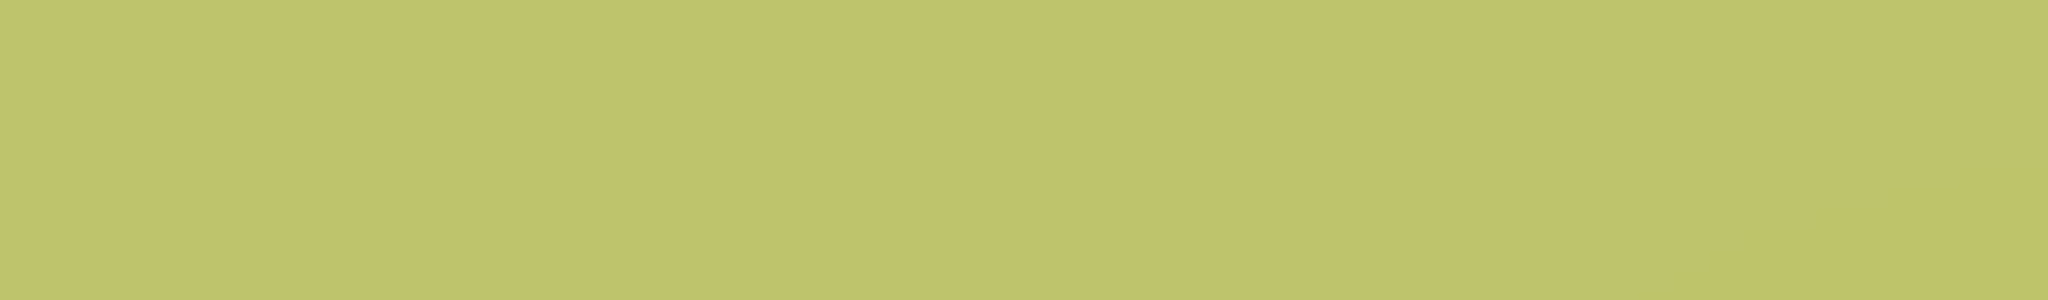 HU 16527 ABS Edge Green Smooth Gloss 90°